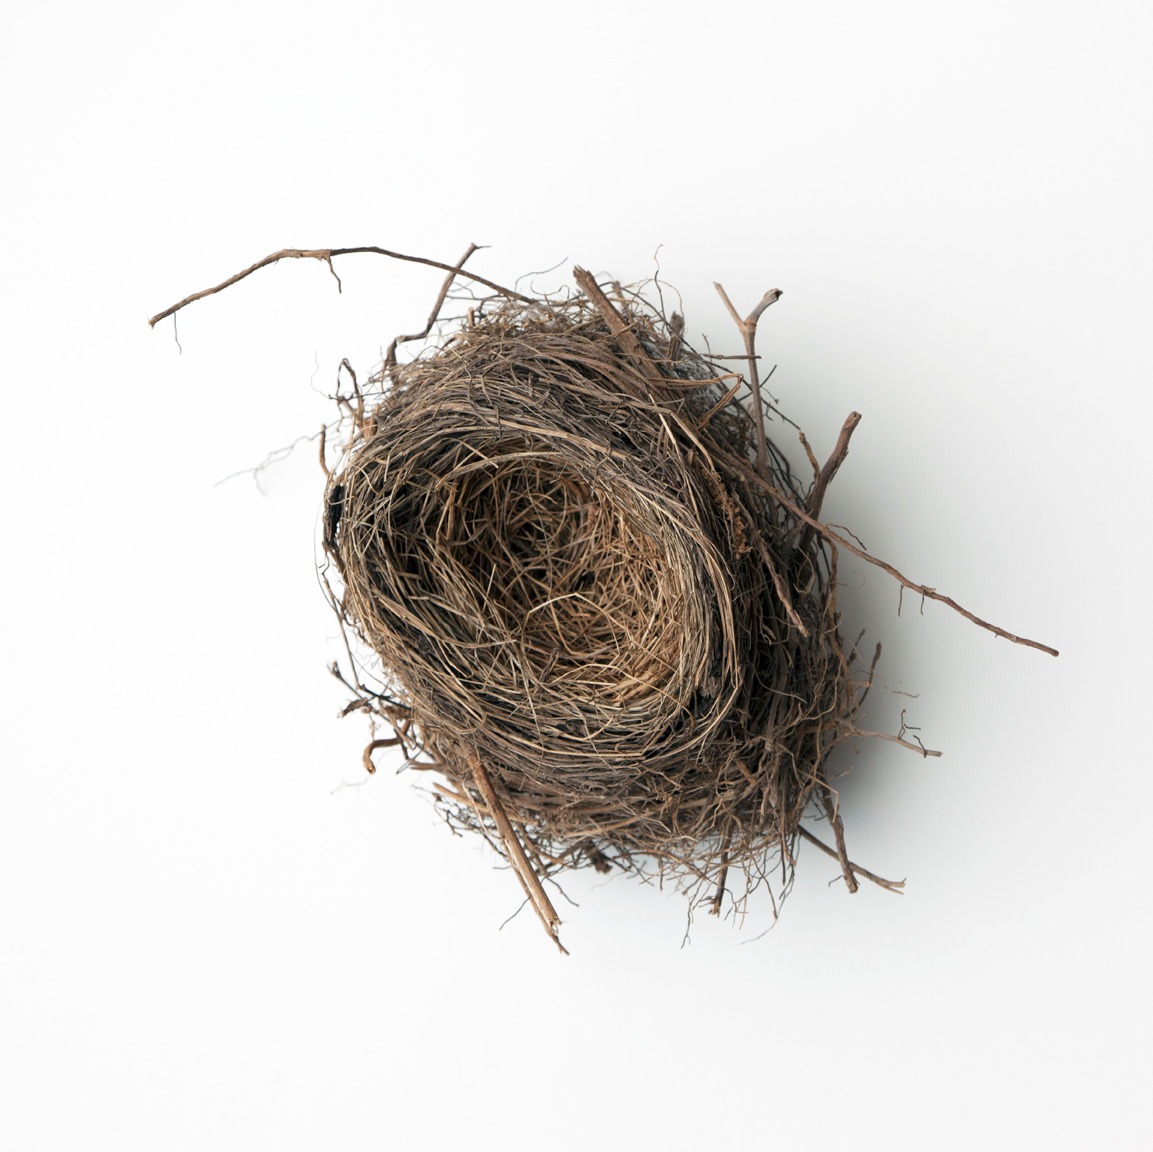 Nest-2543 copy.jpg